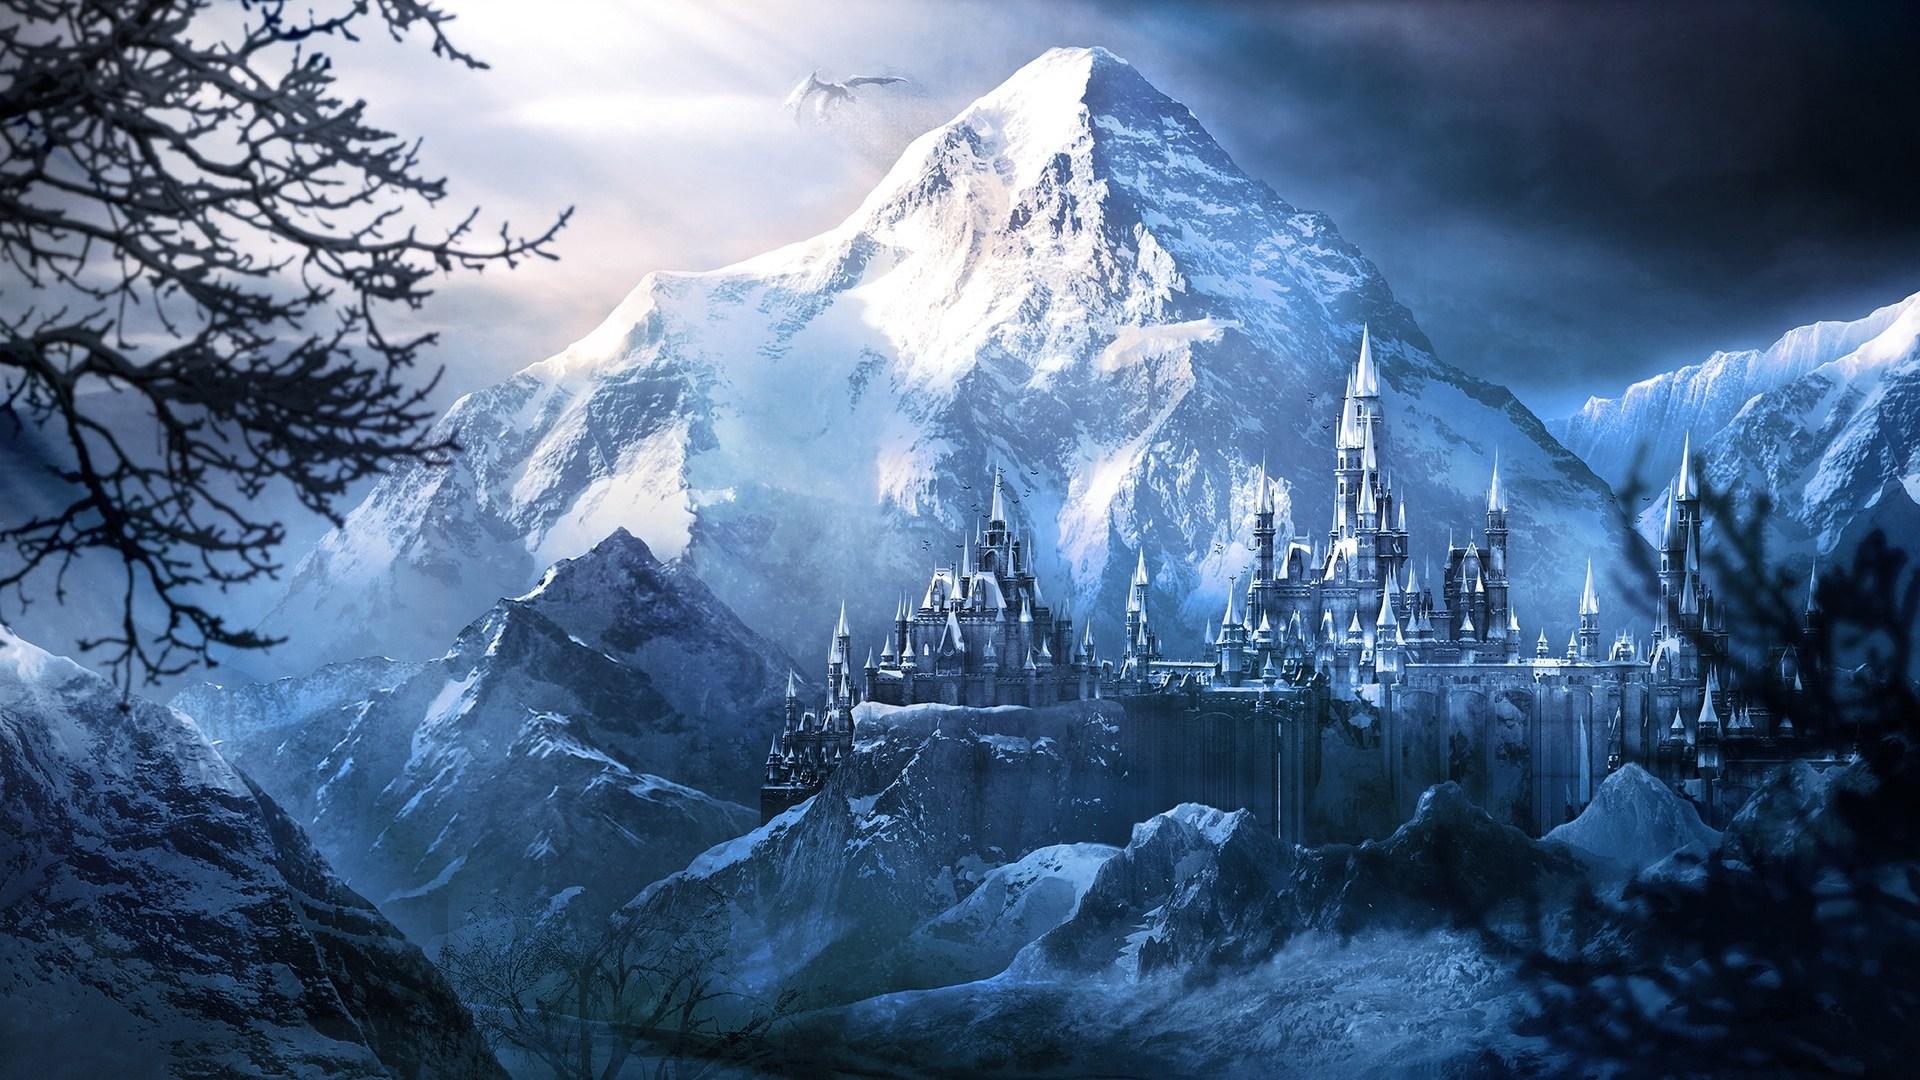 Winter In Mountains Wallpaper - Fantasy Landscape Background , HD Wallpaper & Backgrounds